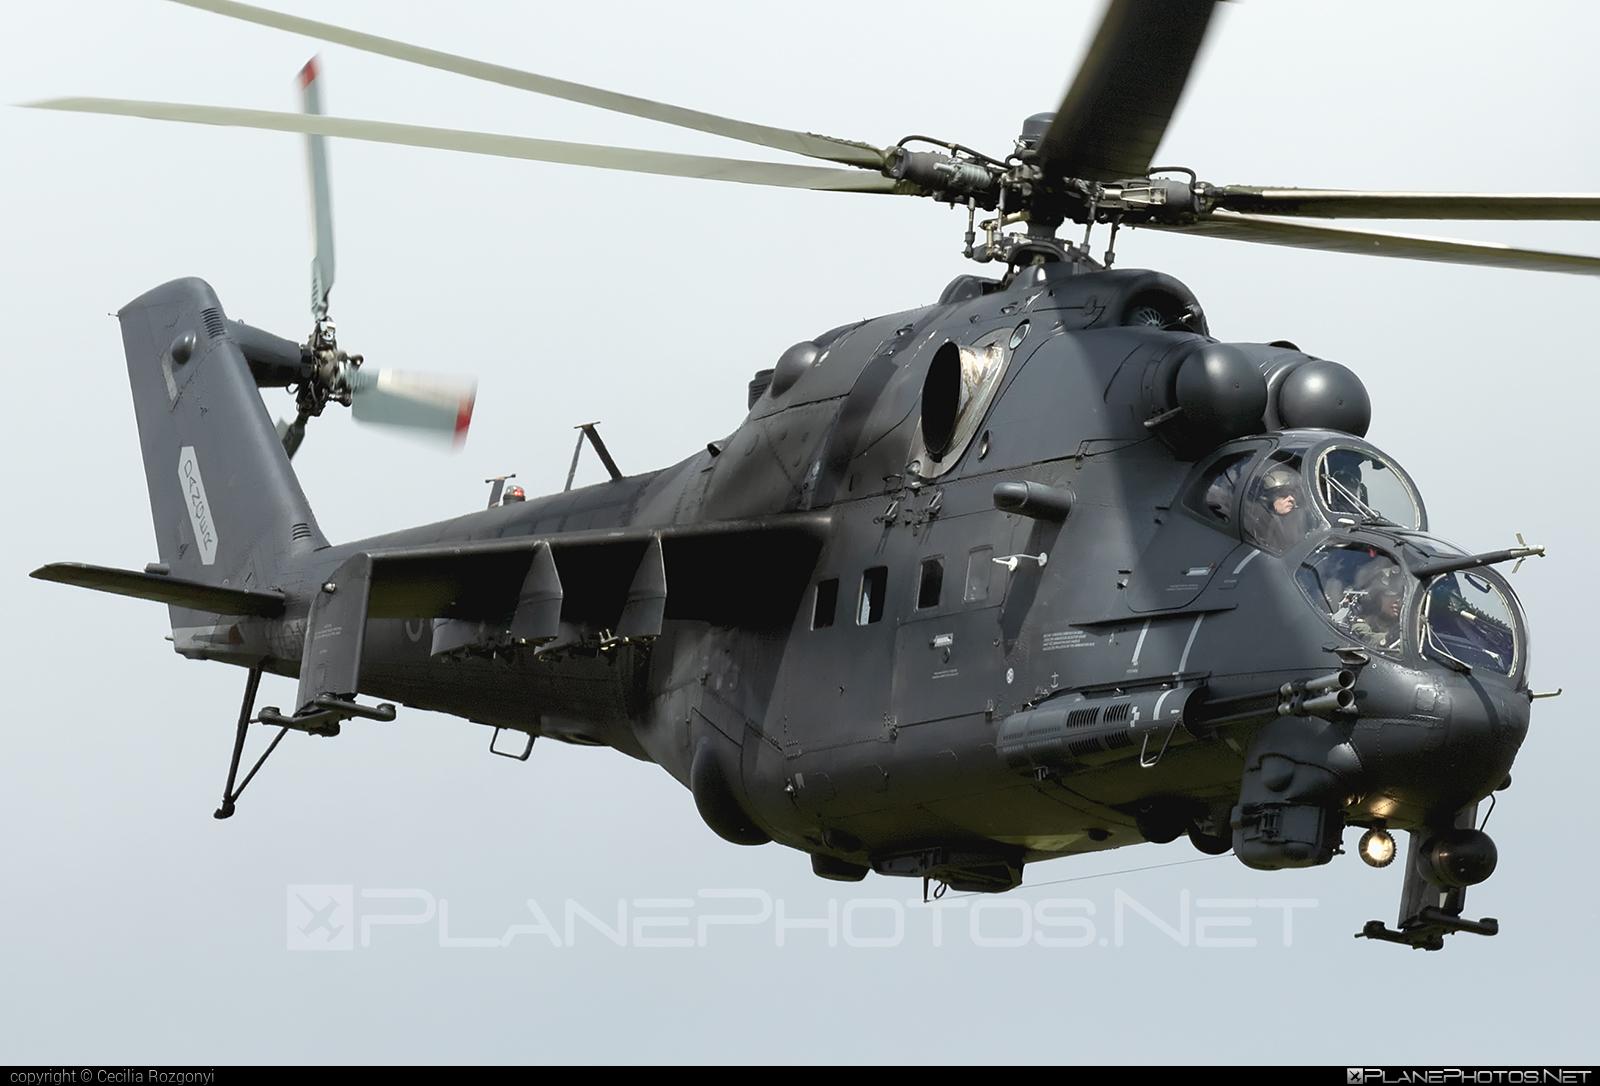 Mil Mi-24P - 332 operated by Magyar Légierő (Hungarian Air Force) #hungarianairforce #magyarlegiero #mi24 #mi24p #mil #mil24 #mil24p #milhelicopters